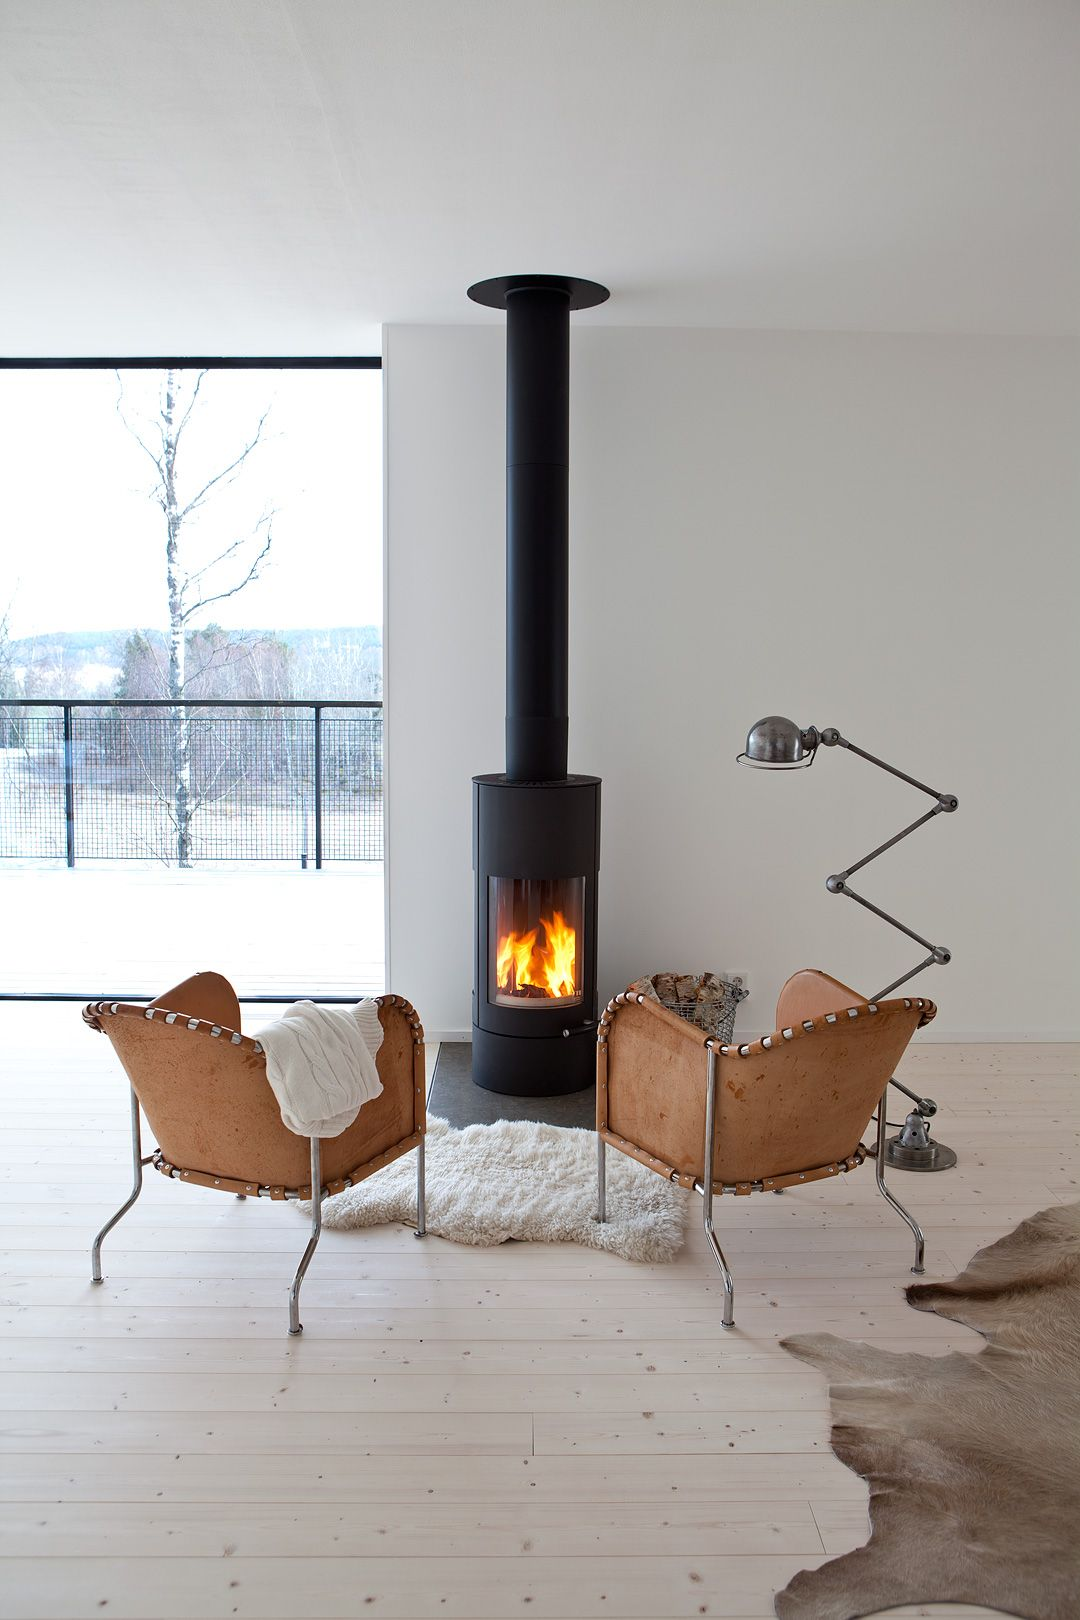 httpwwwemilsbackesehusen Fireplace Winter Inspiration